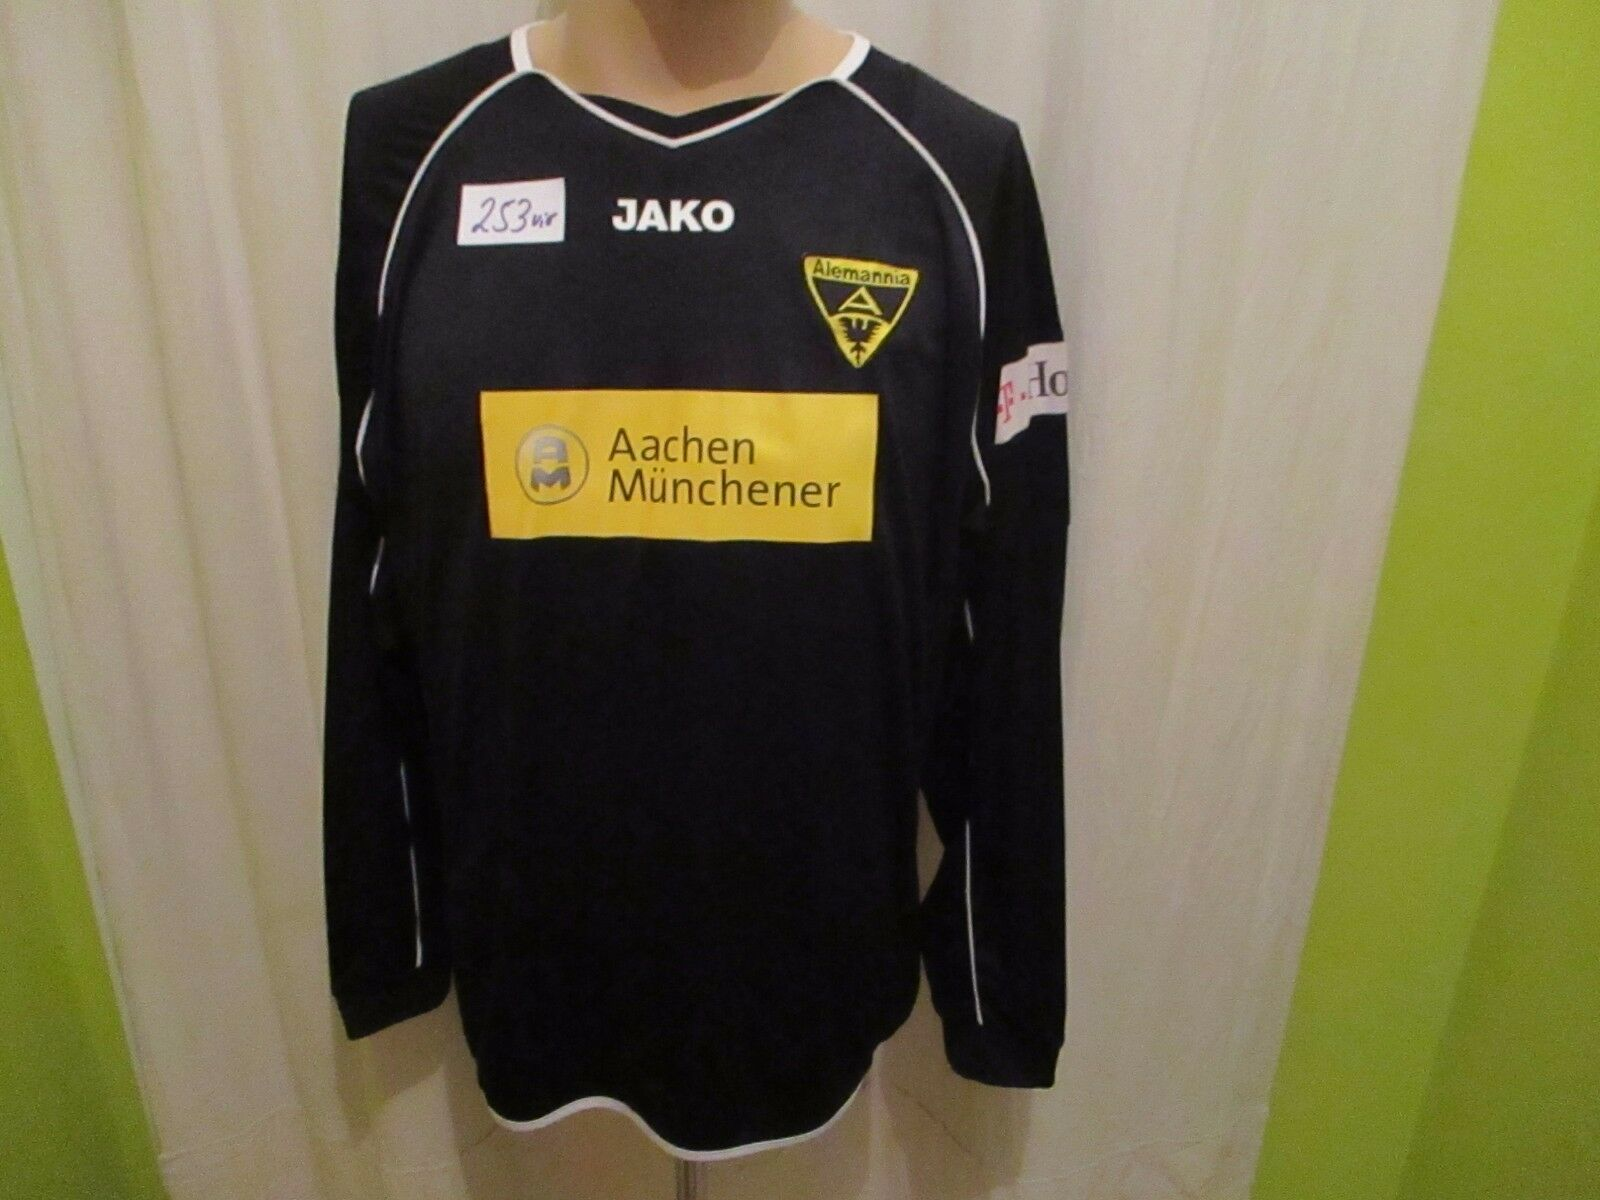 Alemannia Aachen Jako Langarm Matchworn Trikot 2008/09 + + 2008/09 Nr.17 Stehle Gr.XL TOP fad1d2